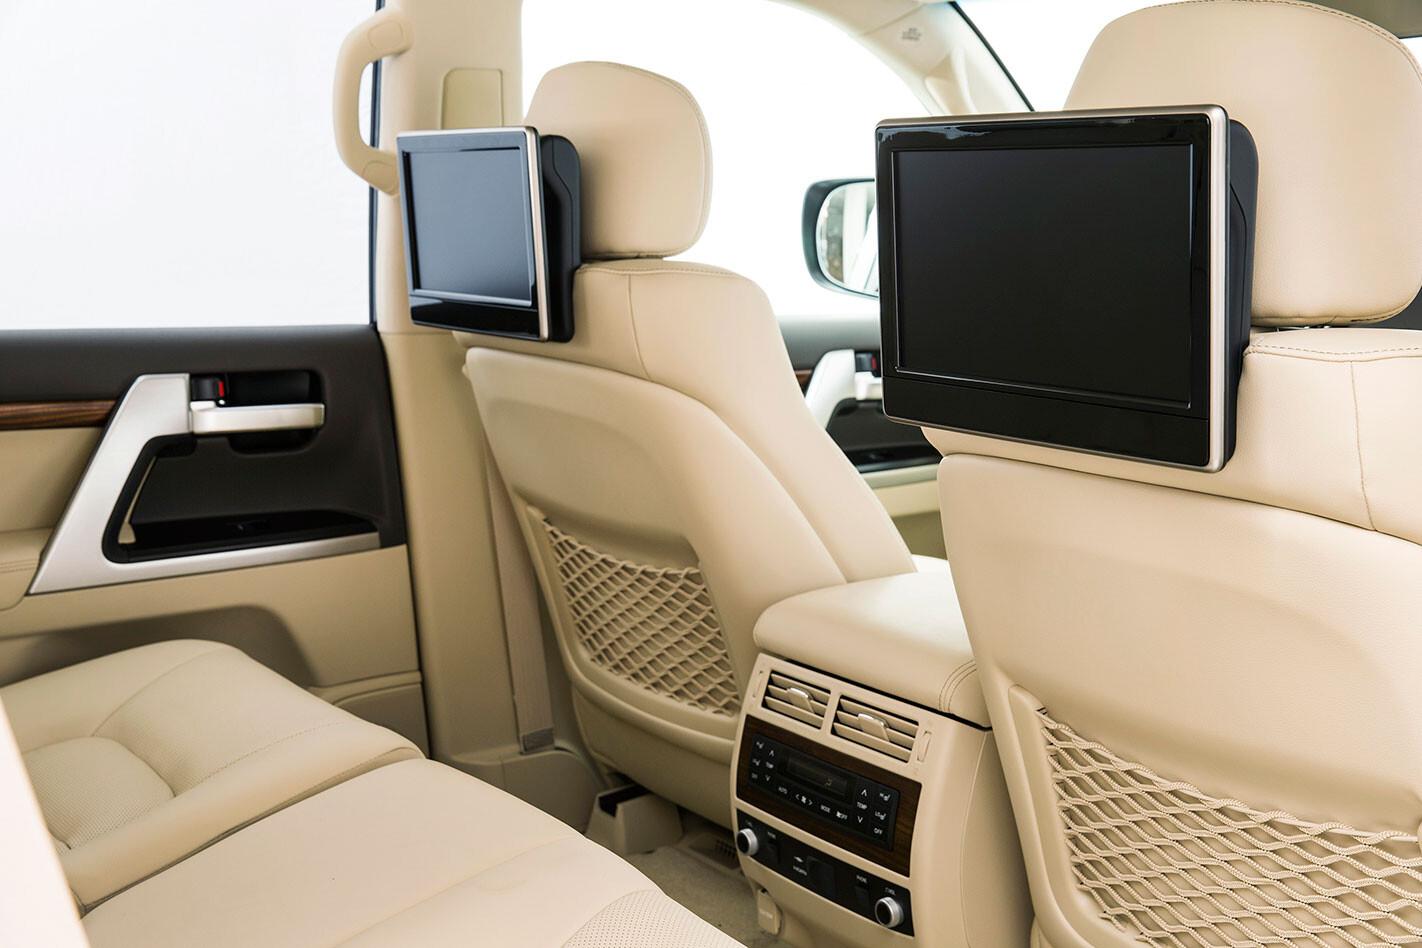 https://d3lp4xedbqa8a5.cloudfront.net/s3/digital-cougar-assets/whichcar/2016/04/08/2513/Toyota-LandCruiser-Sahara-2016-rear-tablets.jpg